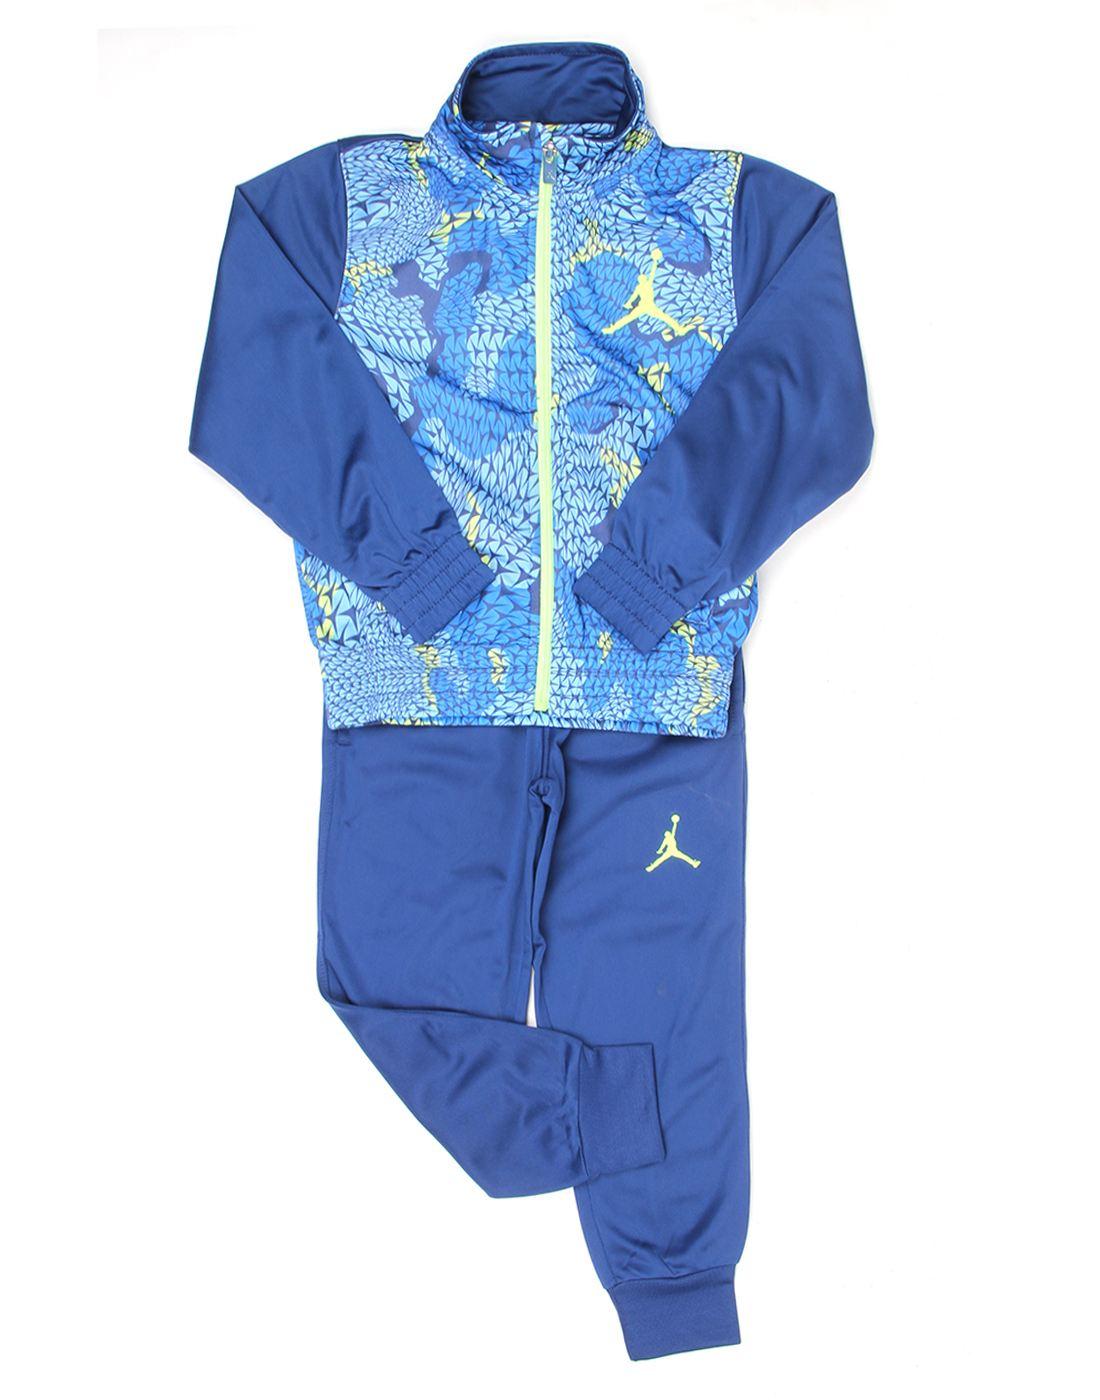 Jordan Boys Blue Self Design Set